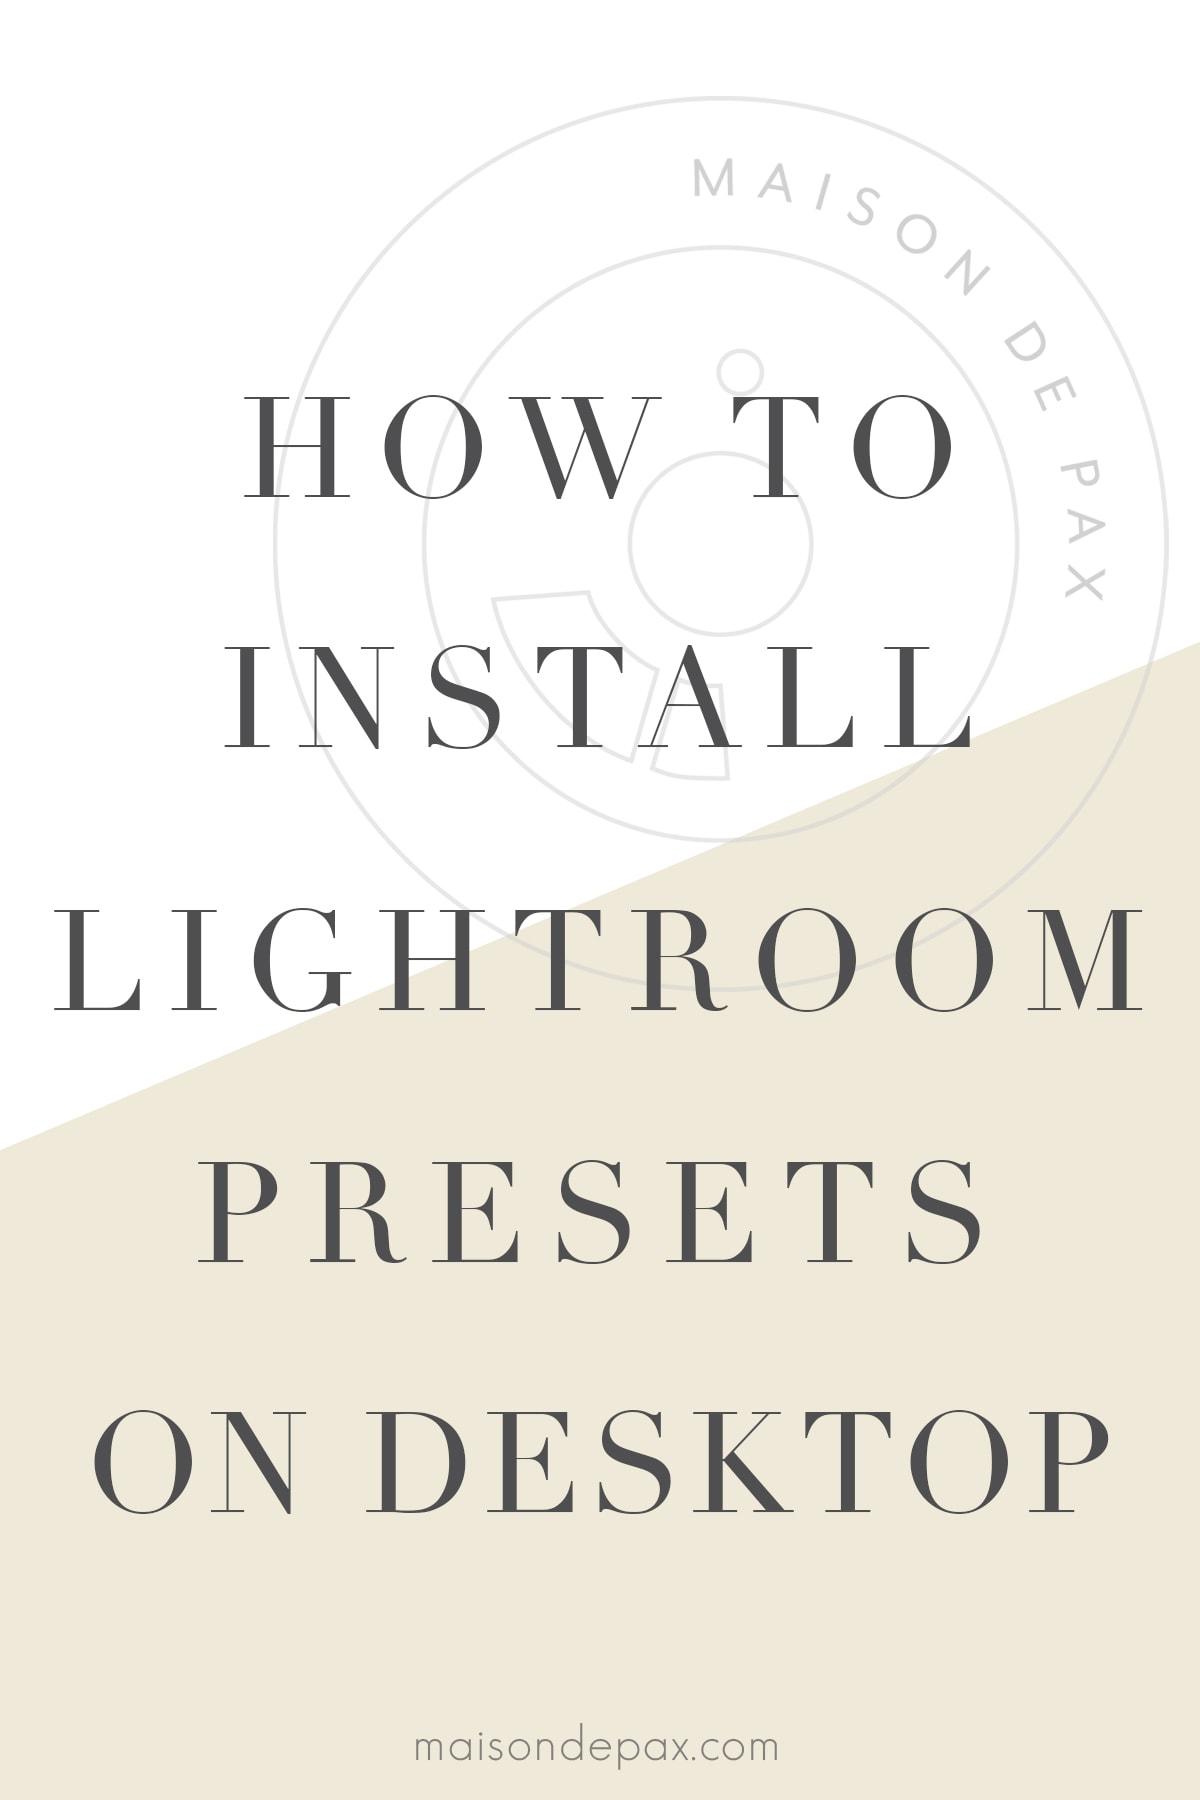 How to Install Lightroom Presets on Desktop - Maison de Pax